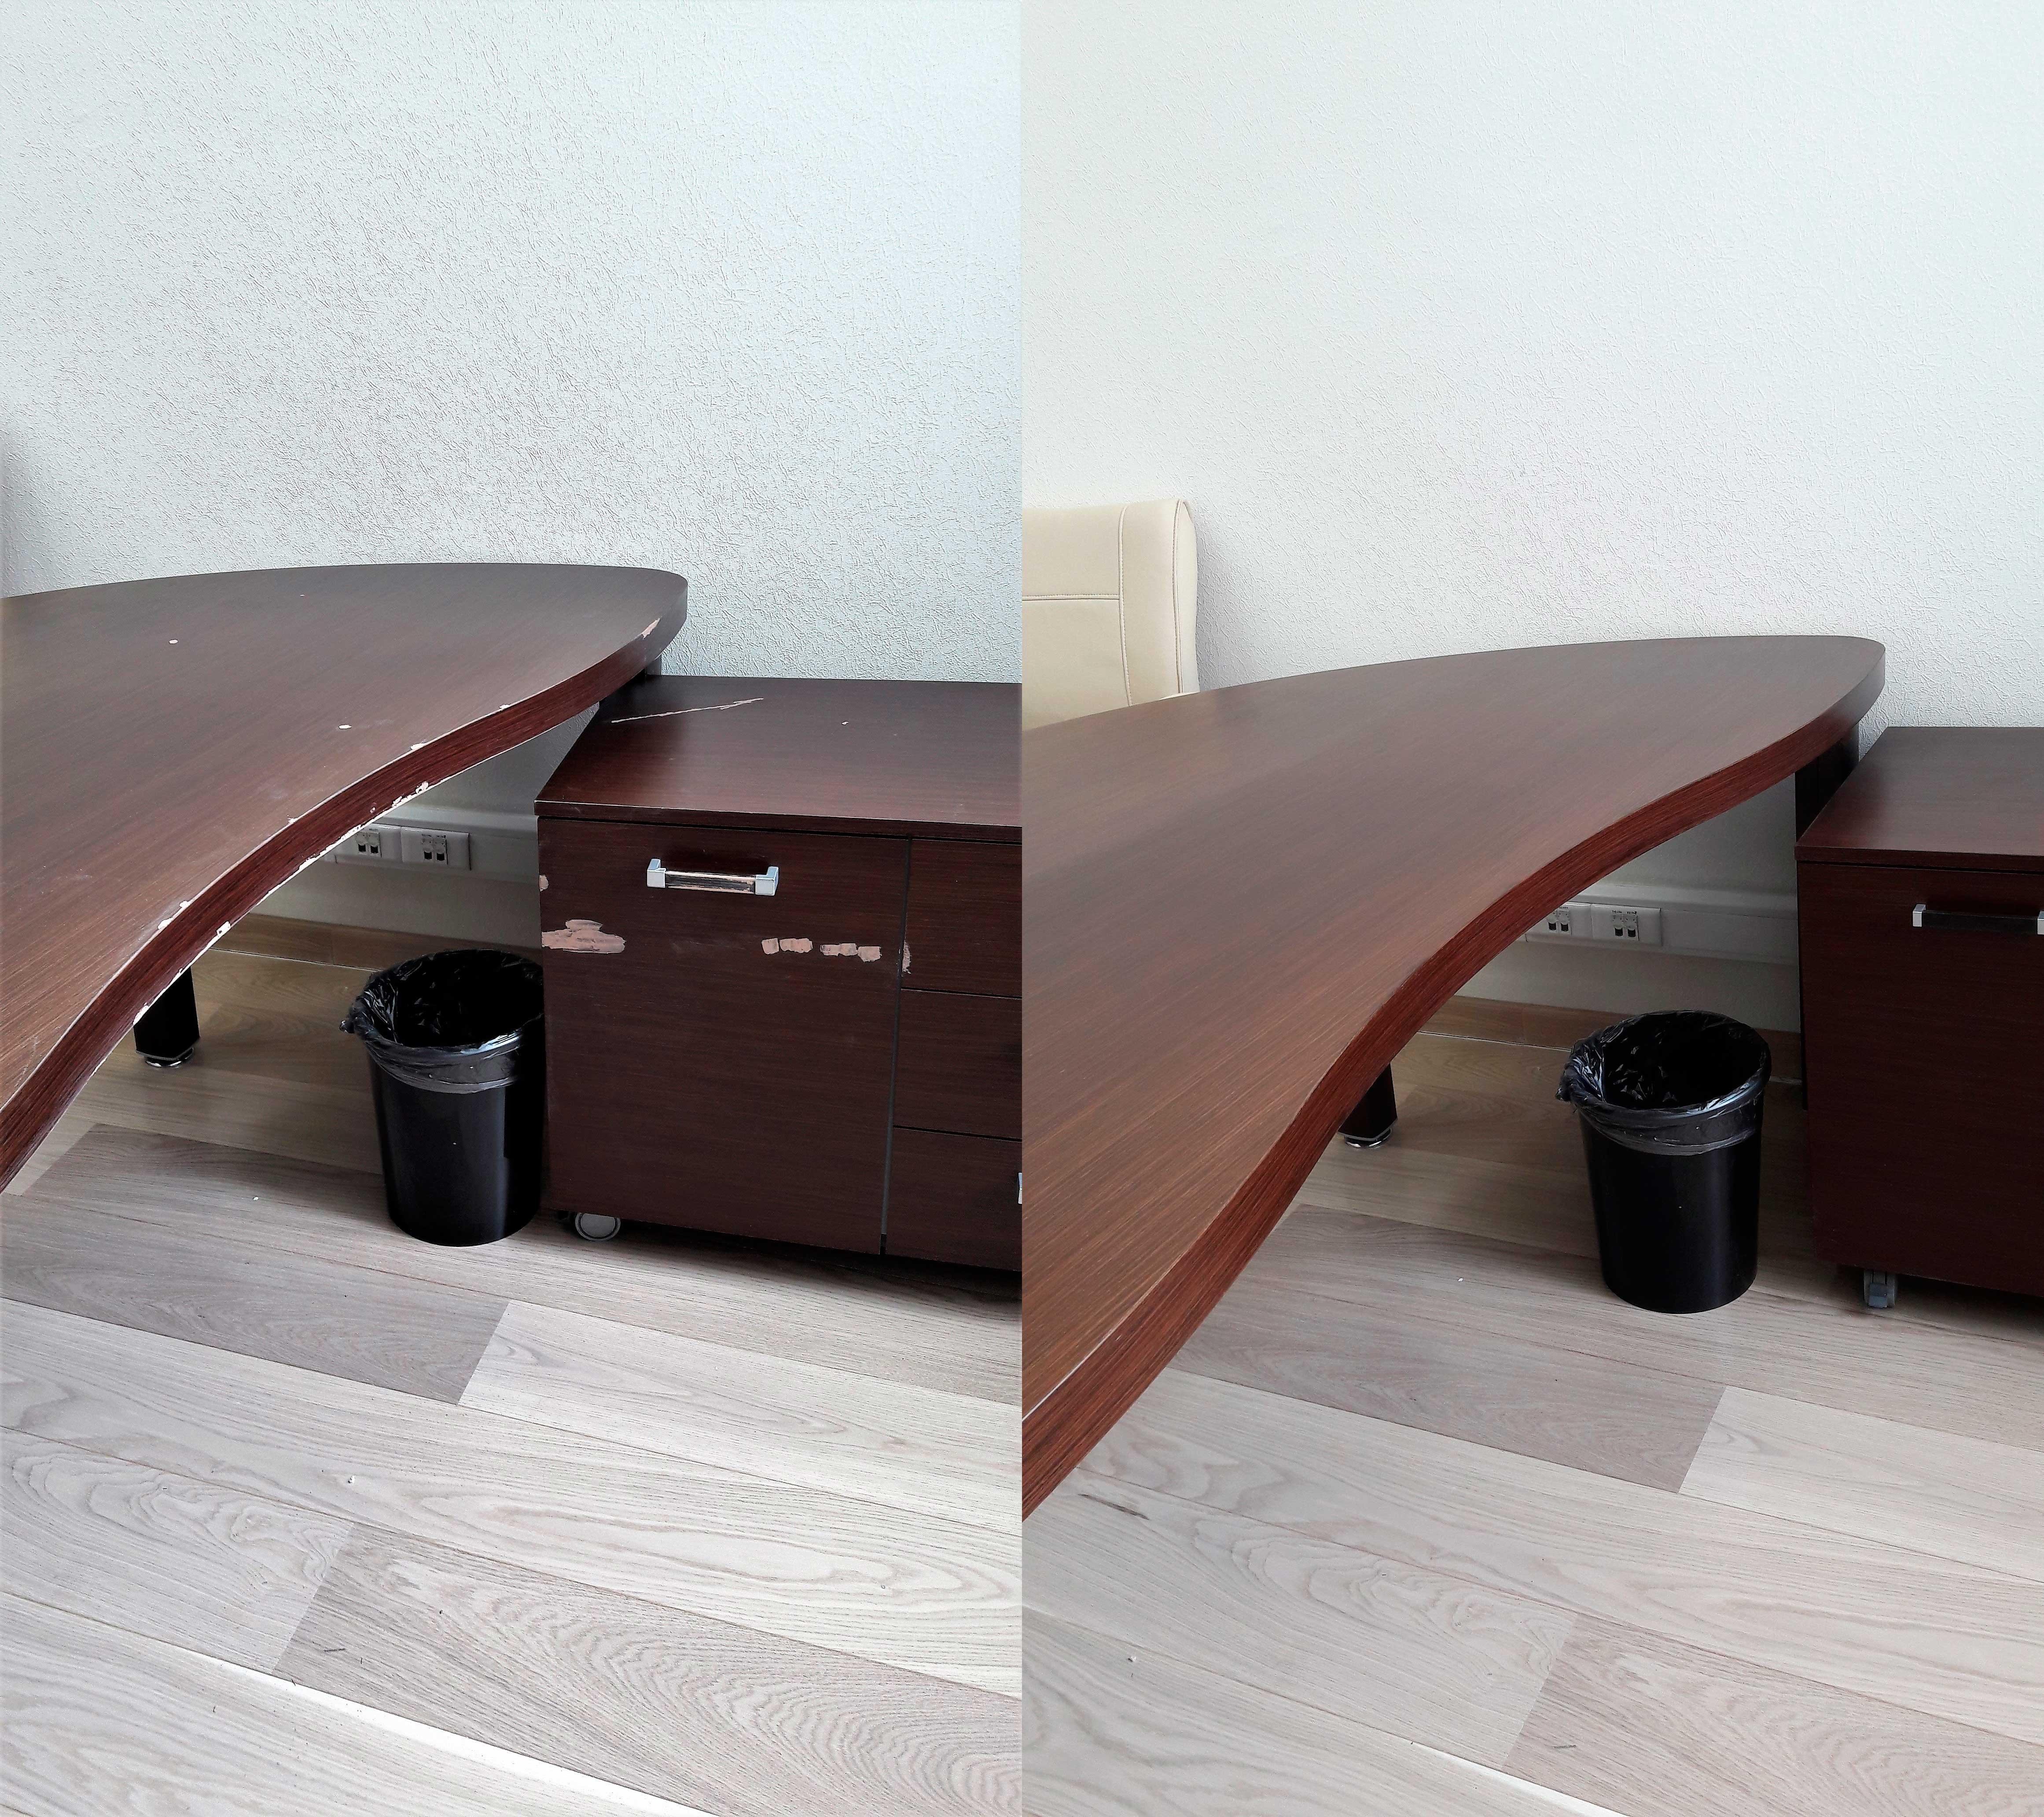 Реставрация офисного стола и тумб